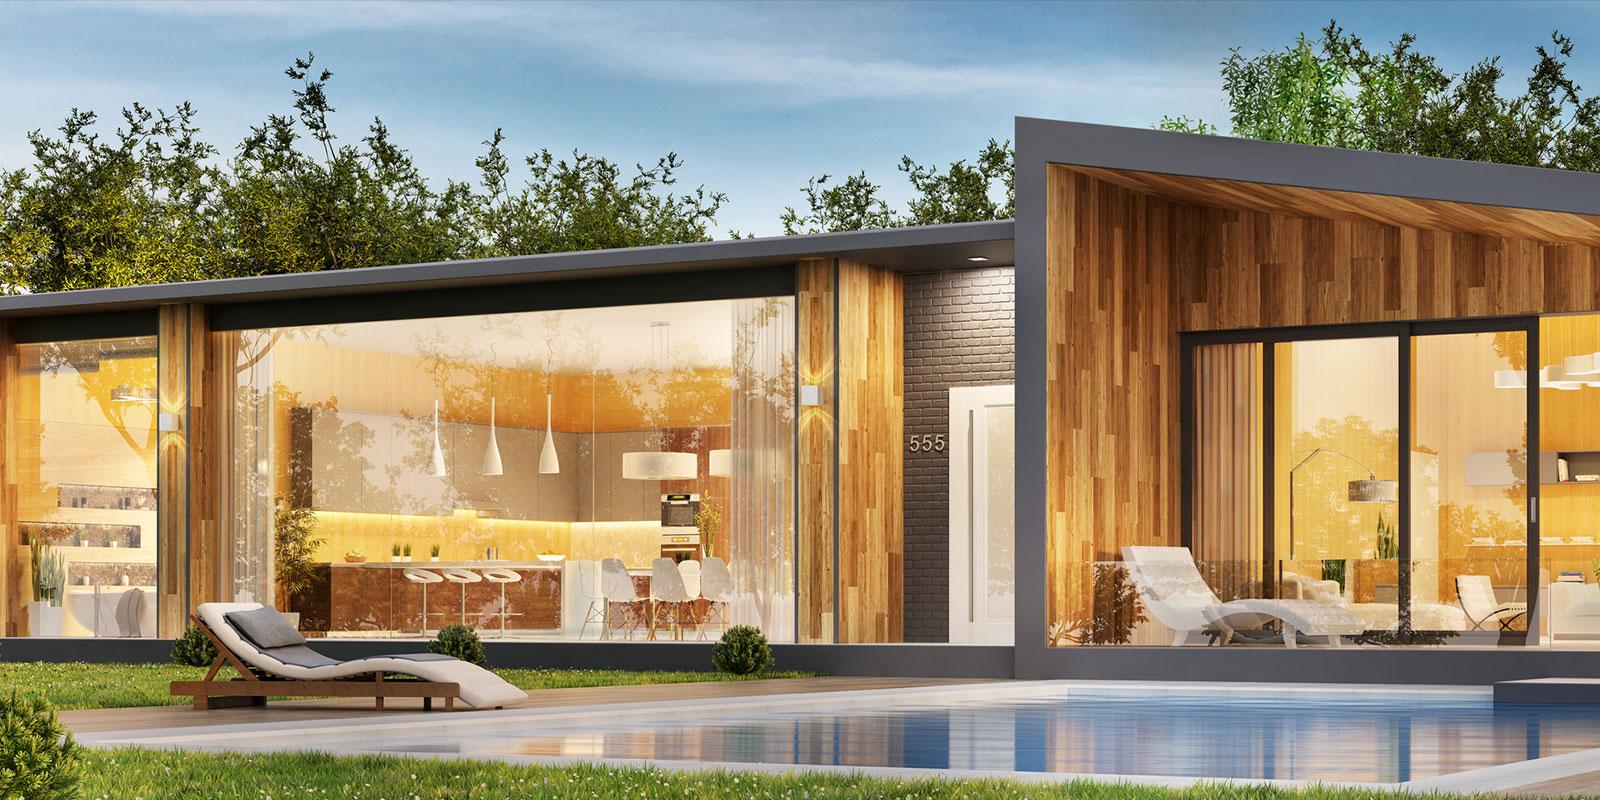 Luxury Real Estate in Rancho Cucamonga